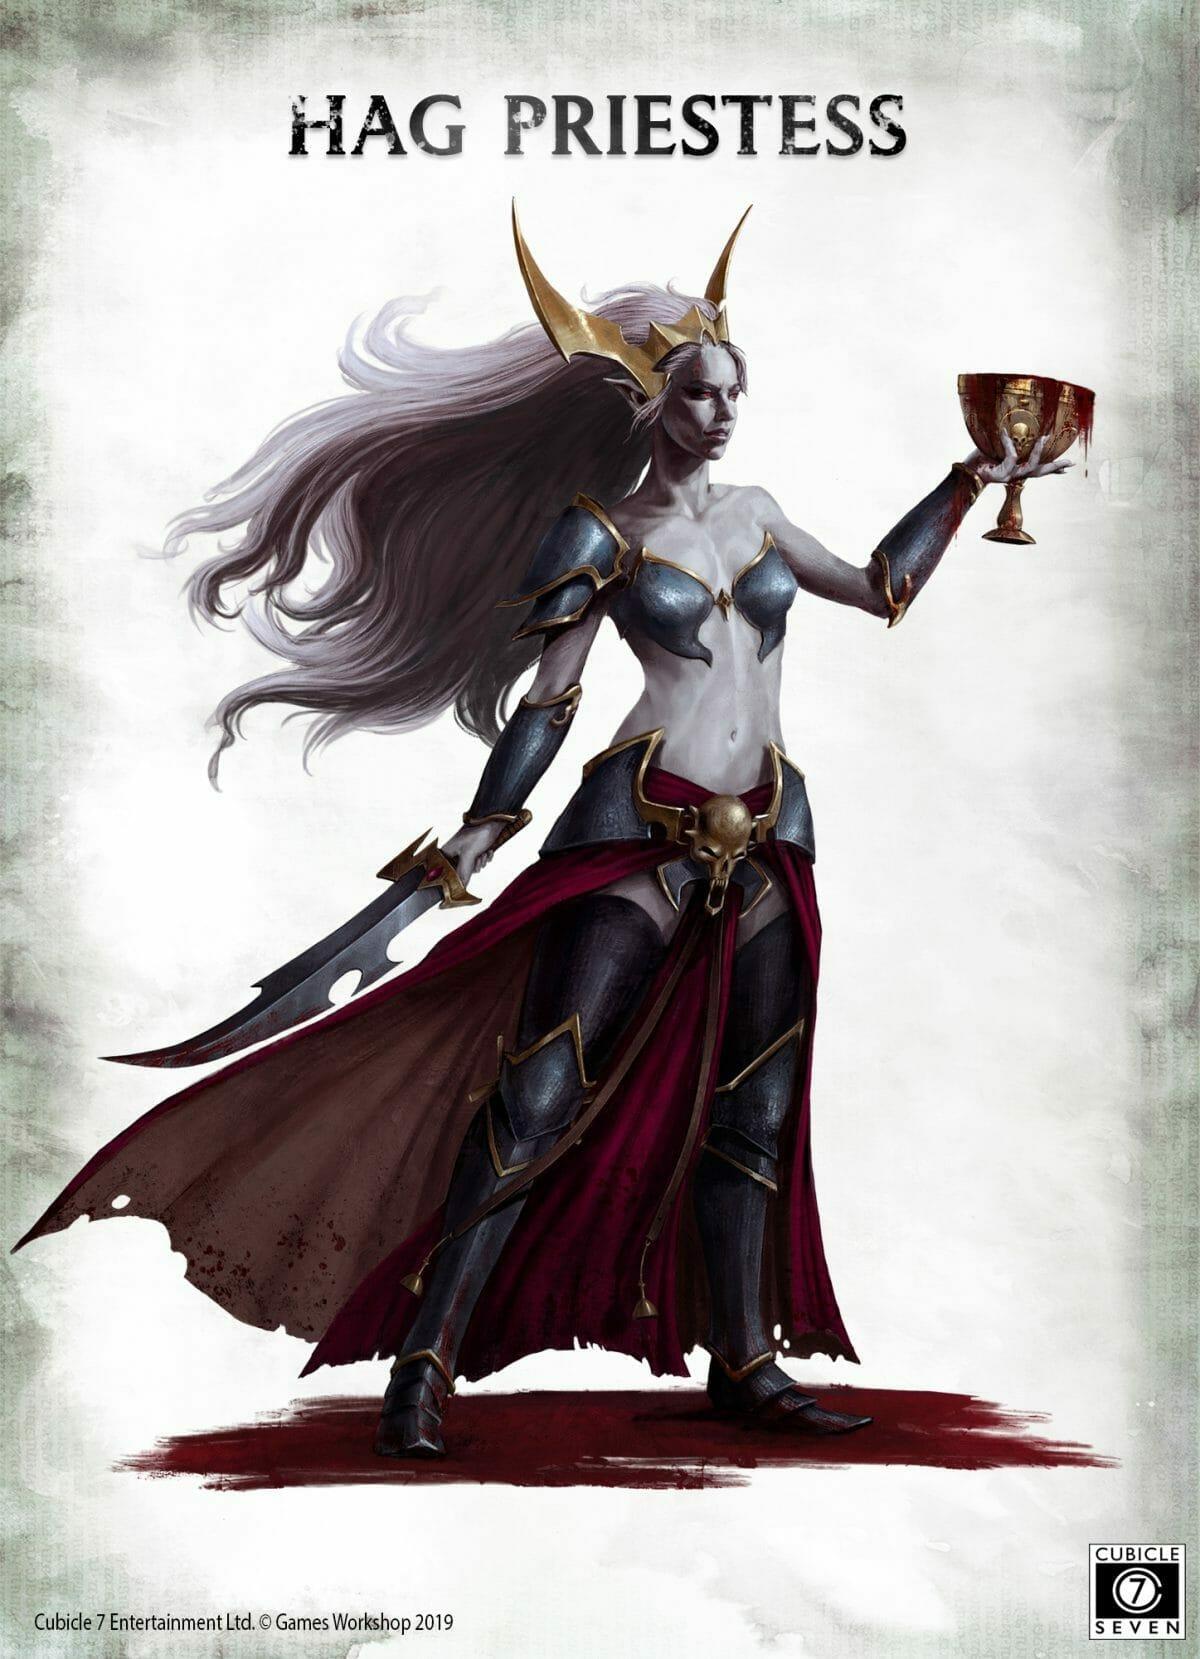 Hag Priestess